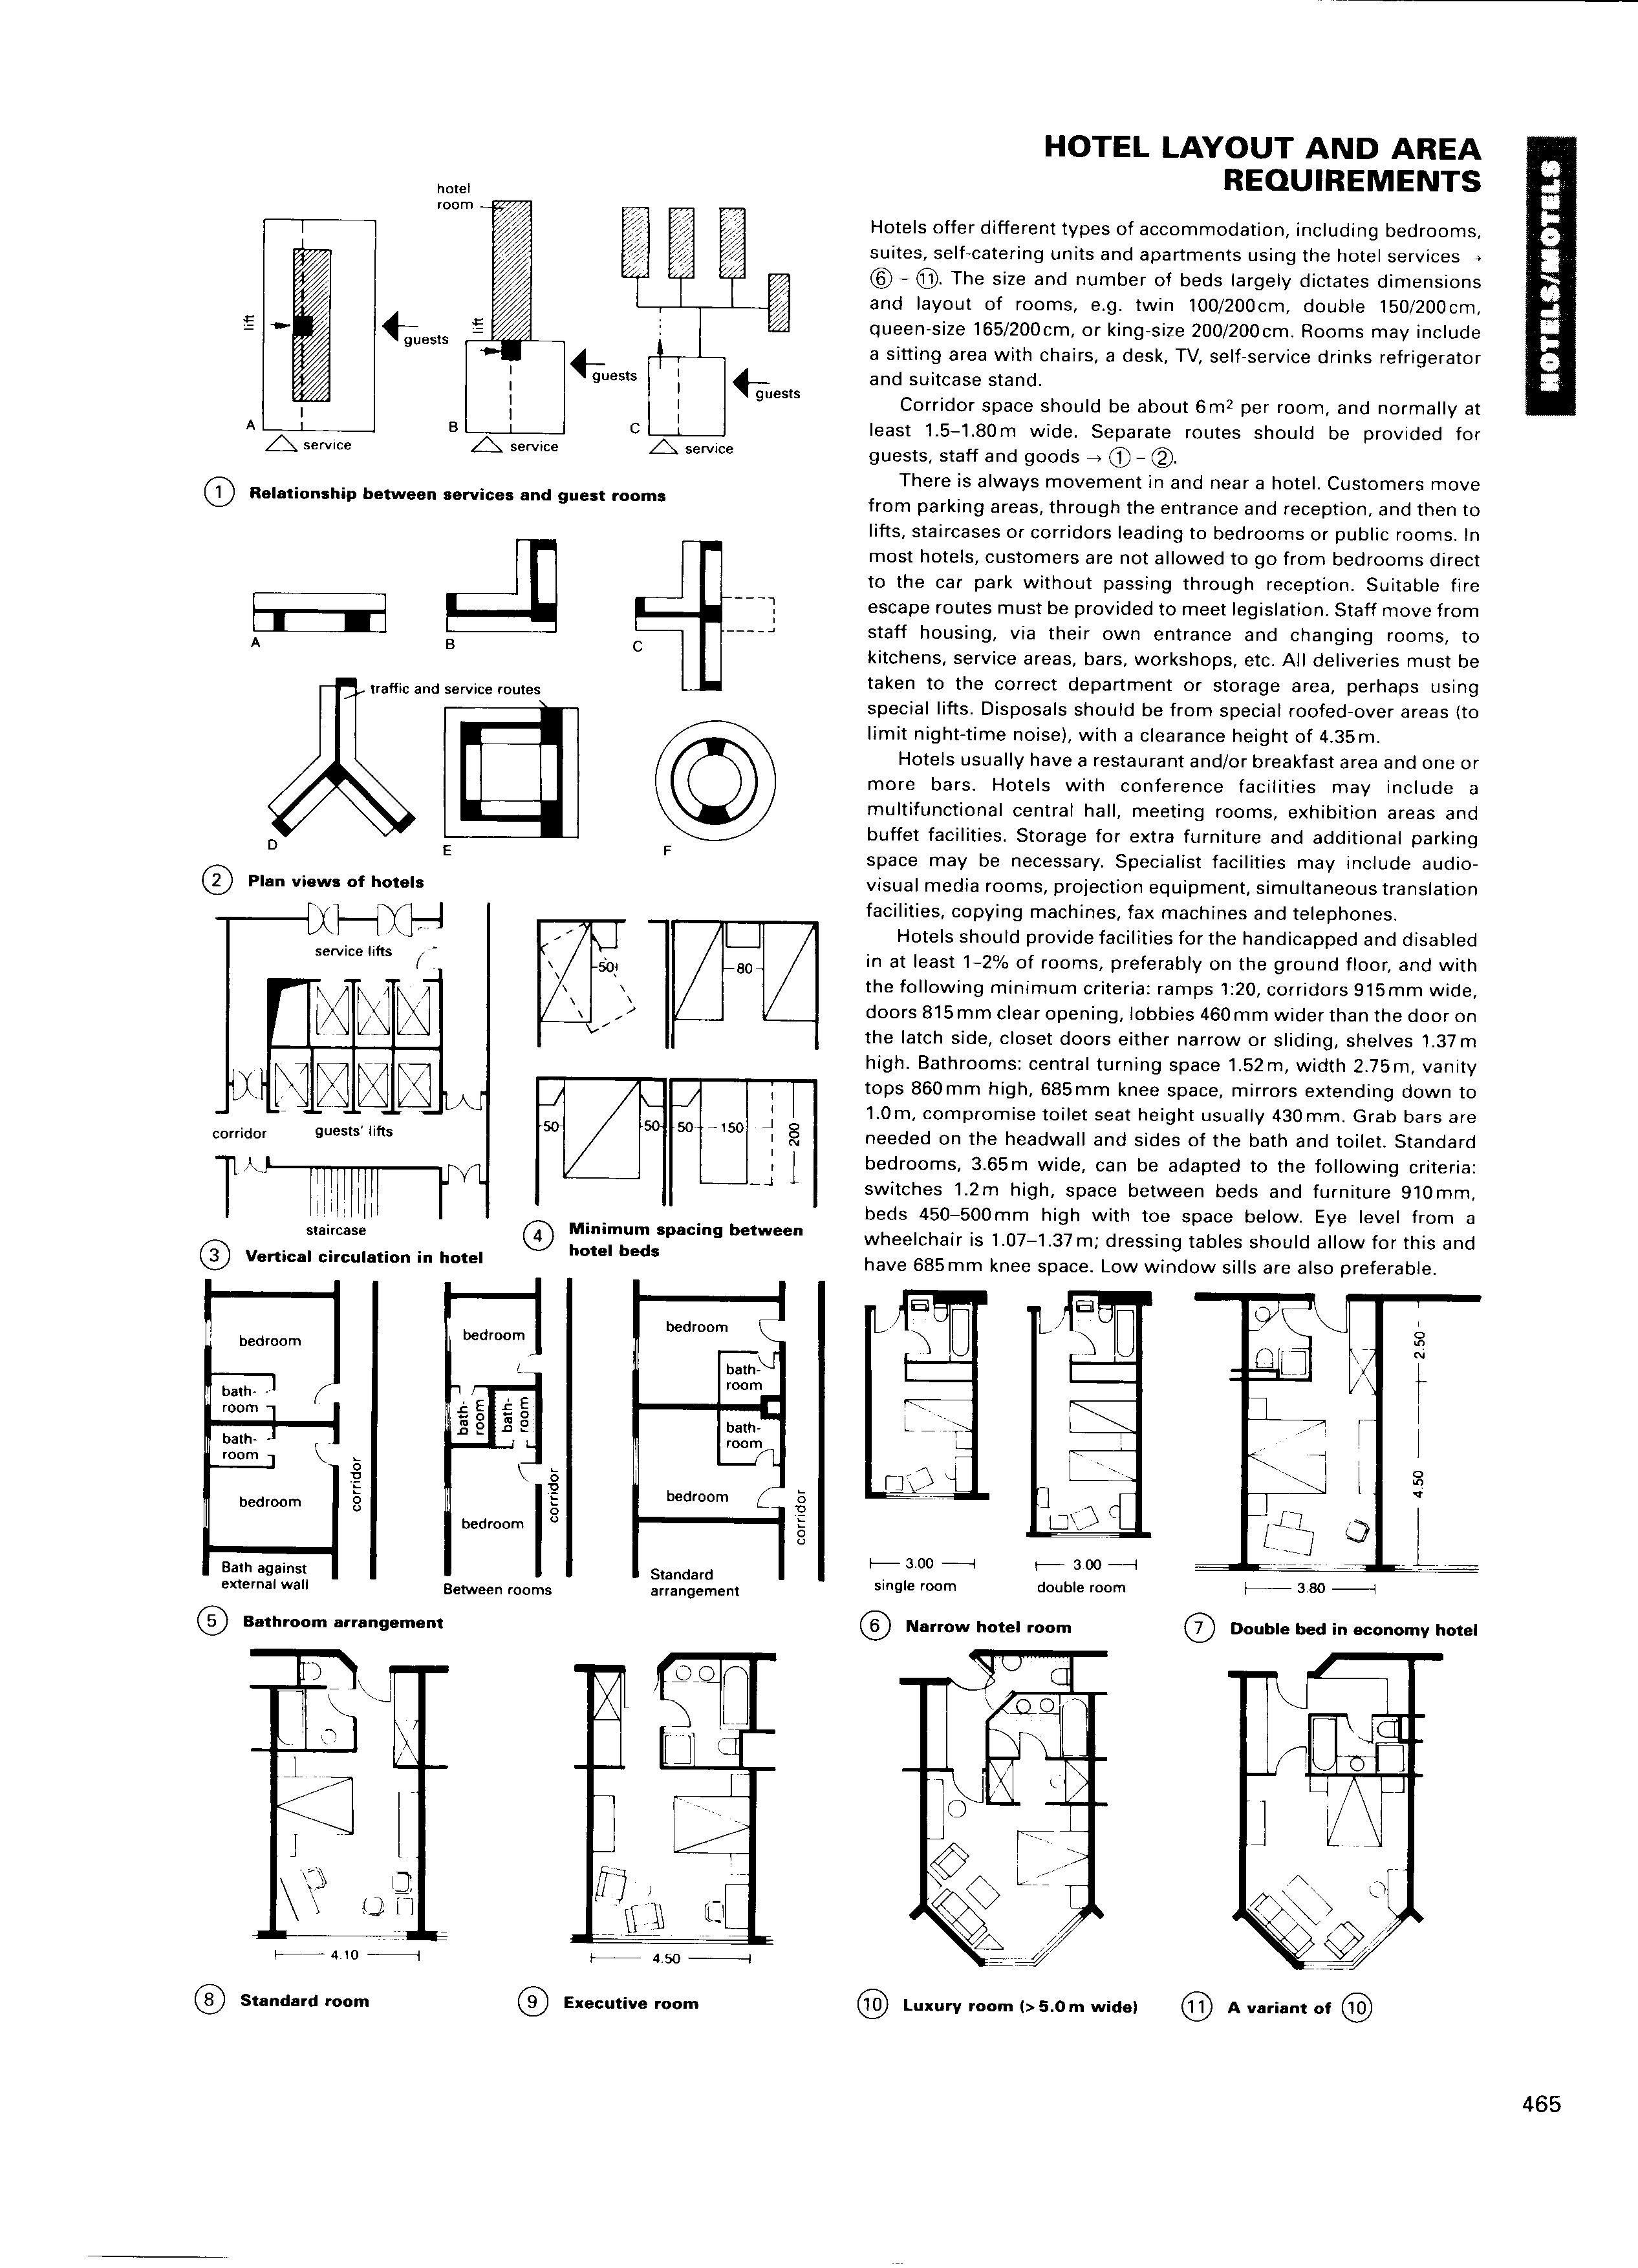 Architectural standard ernst peter neufert hotel for Neufert mesas